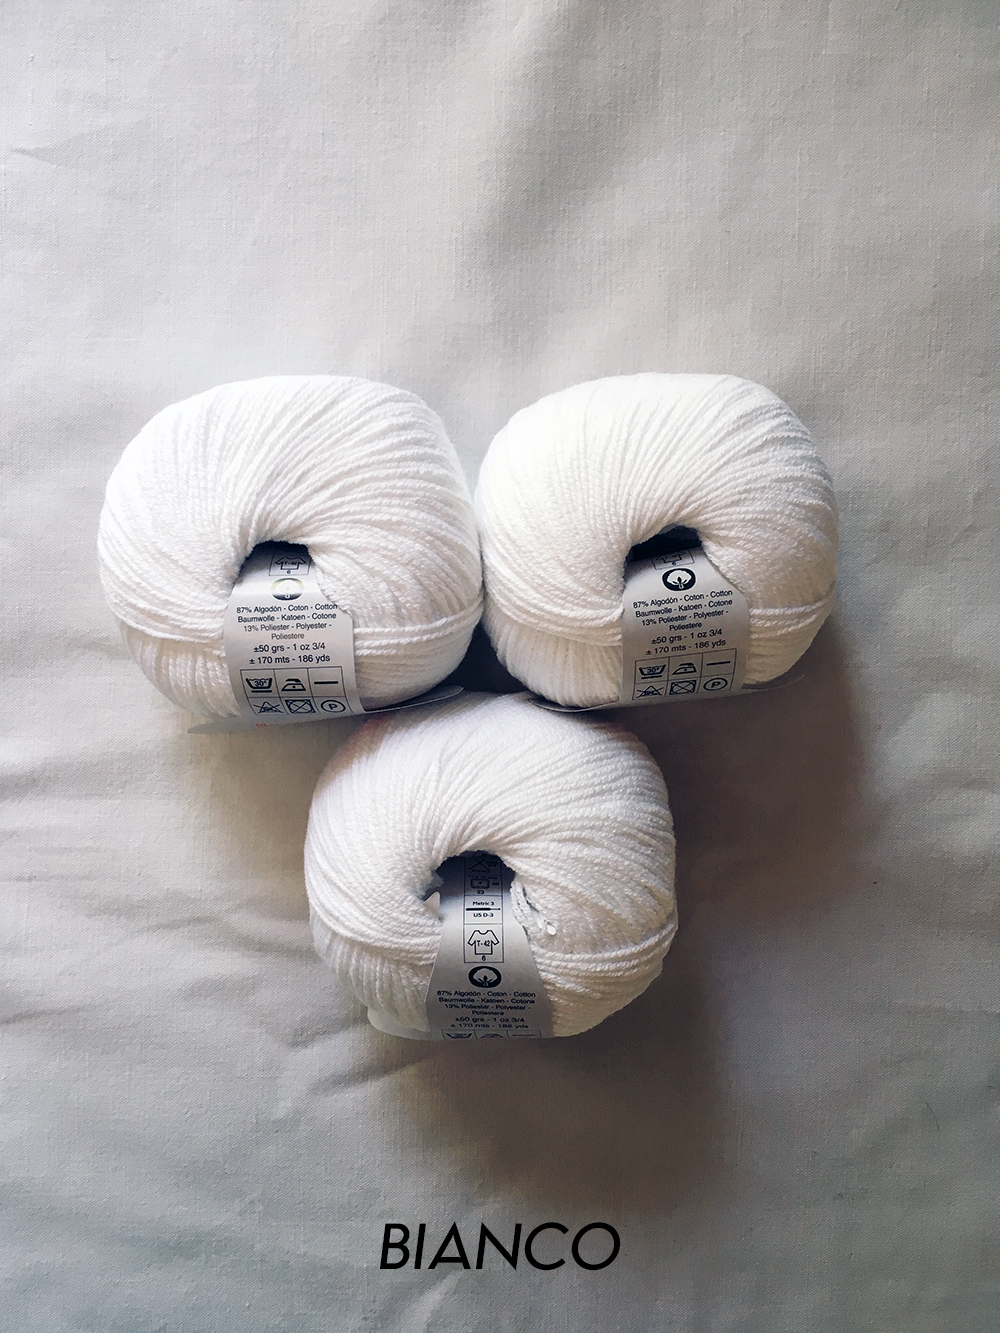 katia_cotton_stretch_bianco_1_wool_done_knitting.jpg